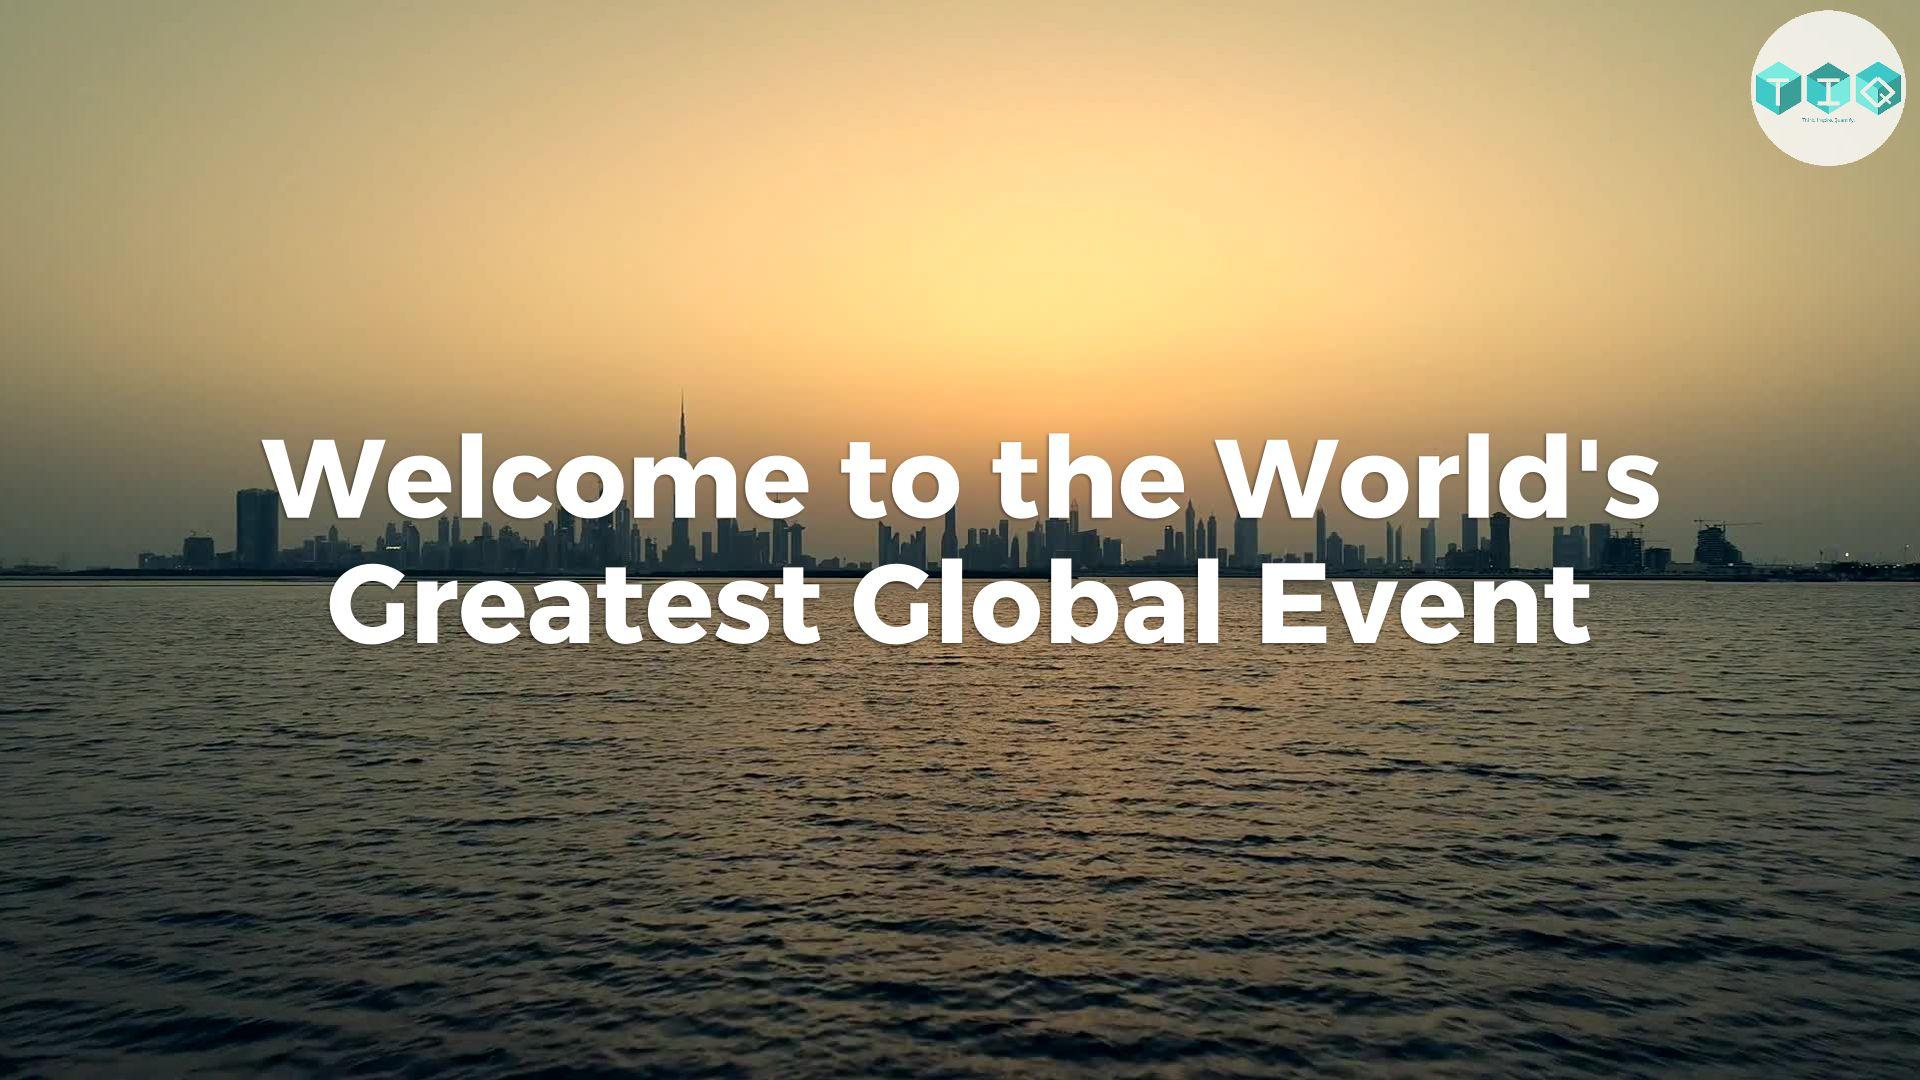 World's Greatest Global Event, Digital marketing at Expo 2020 UAE Dubai